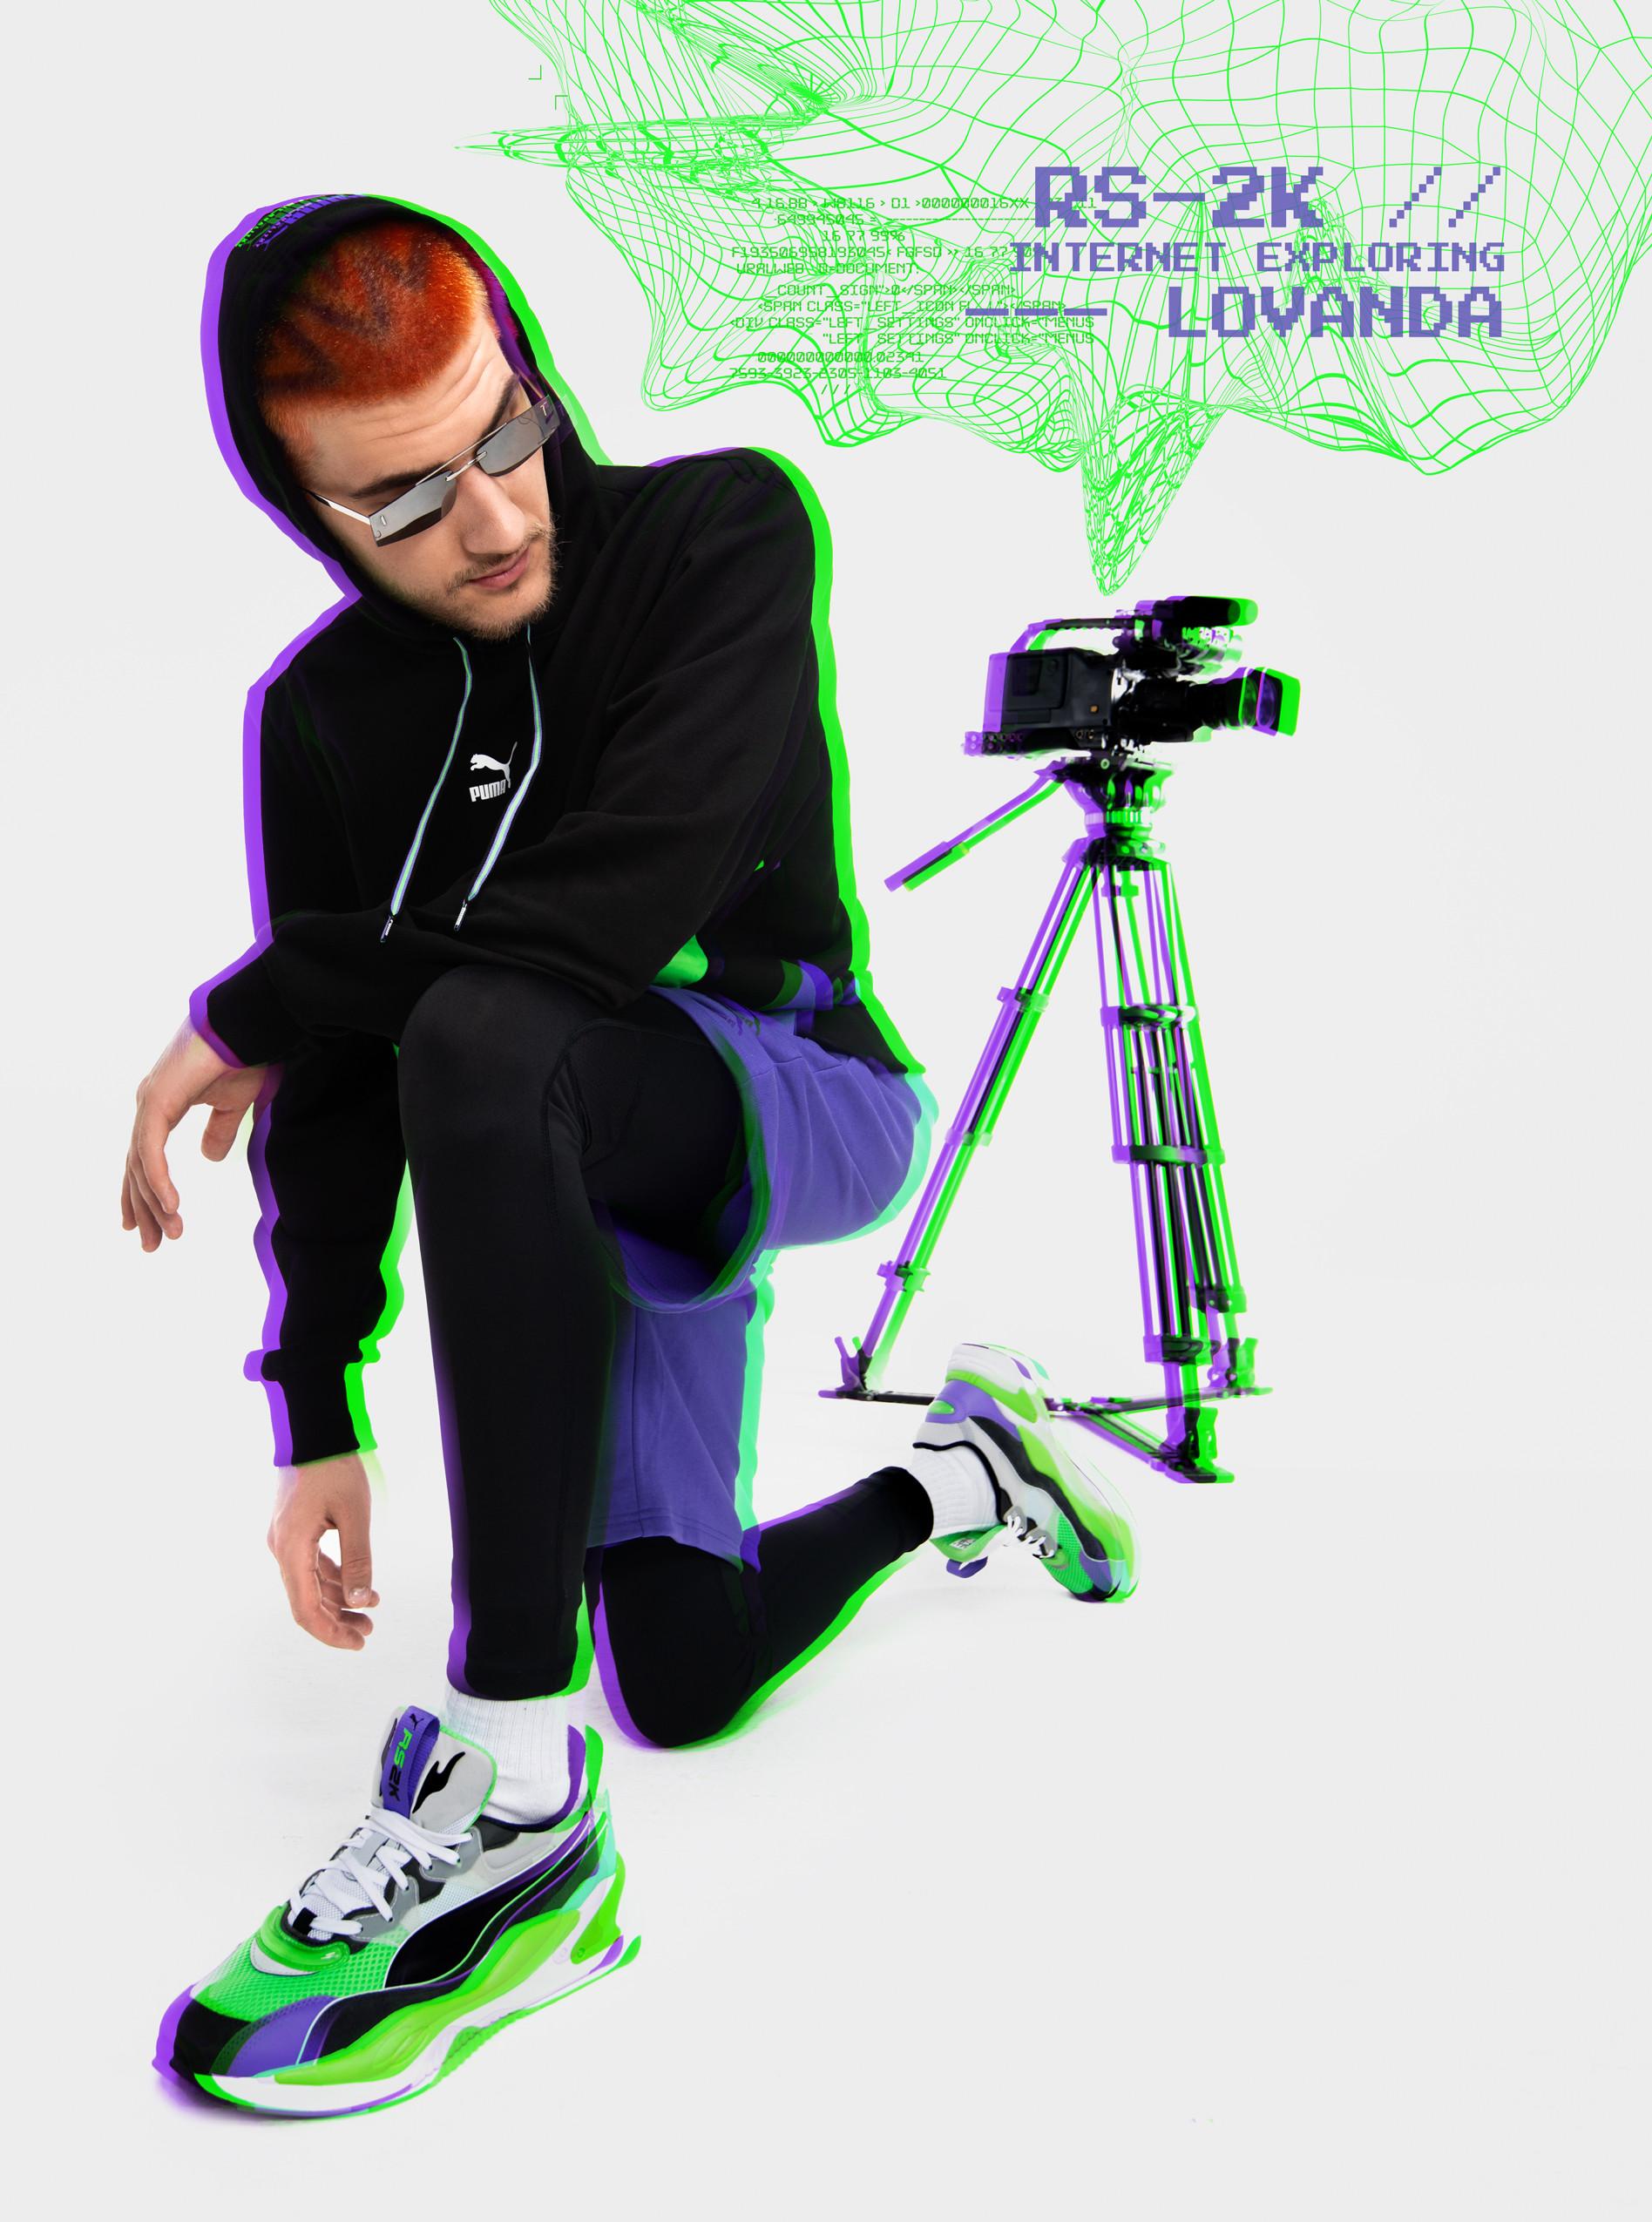 Lovanda_RS2K_10_Graphics_web.jpg